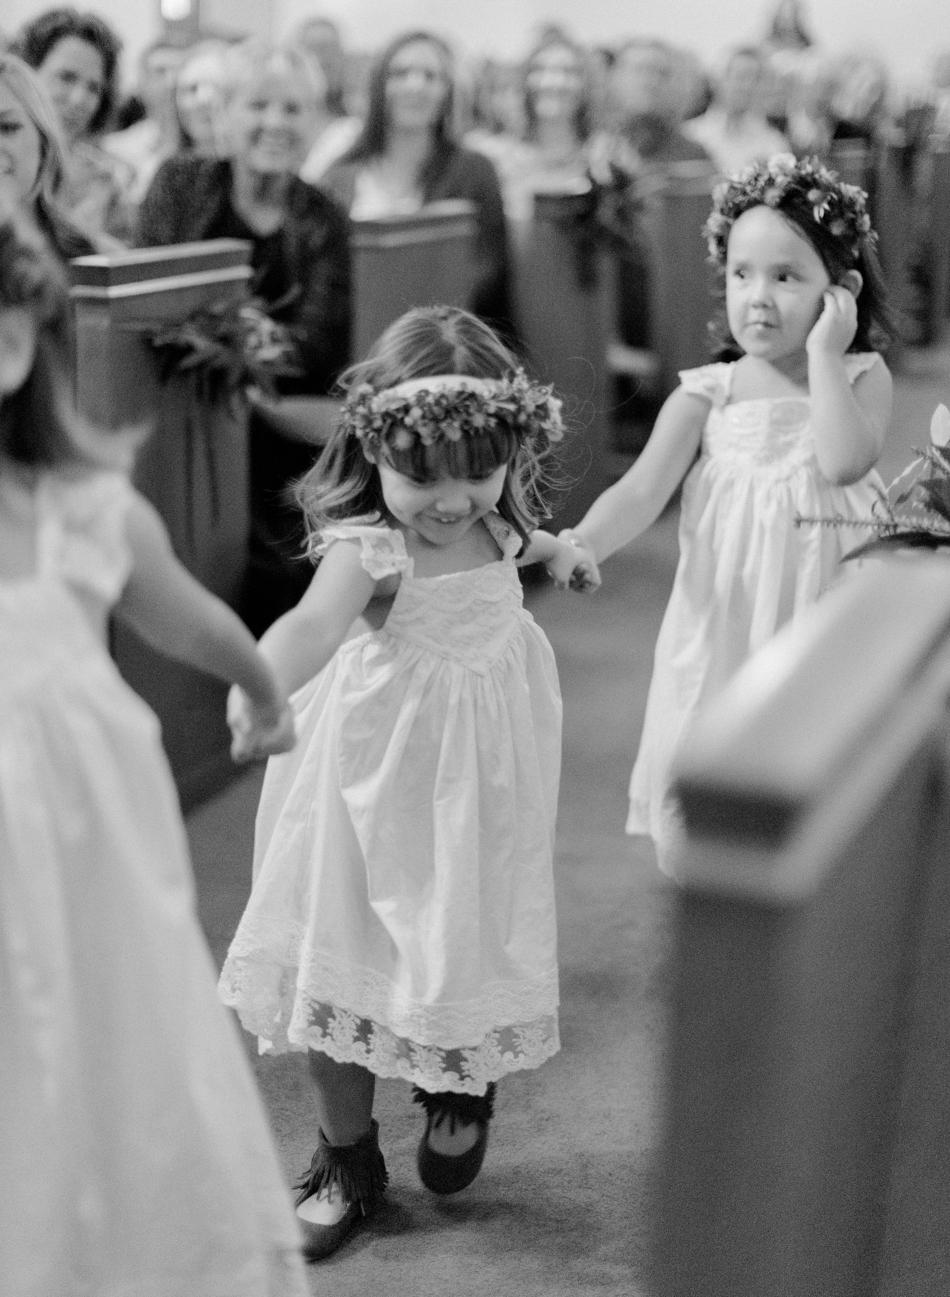 WildcatterRanch-WeddingPhotographer312.jpg